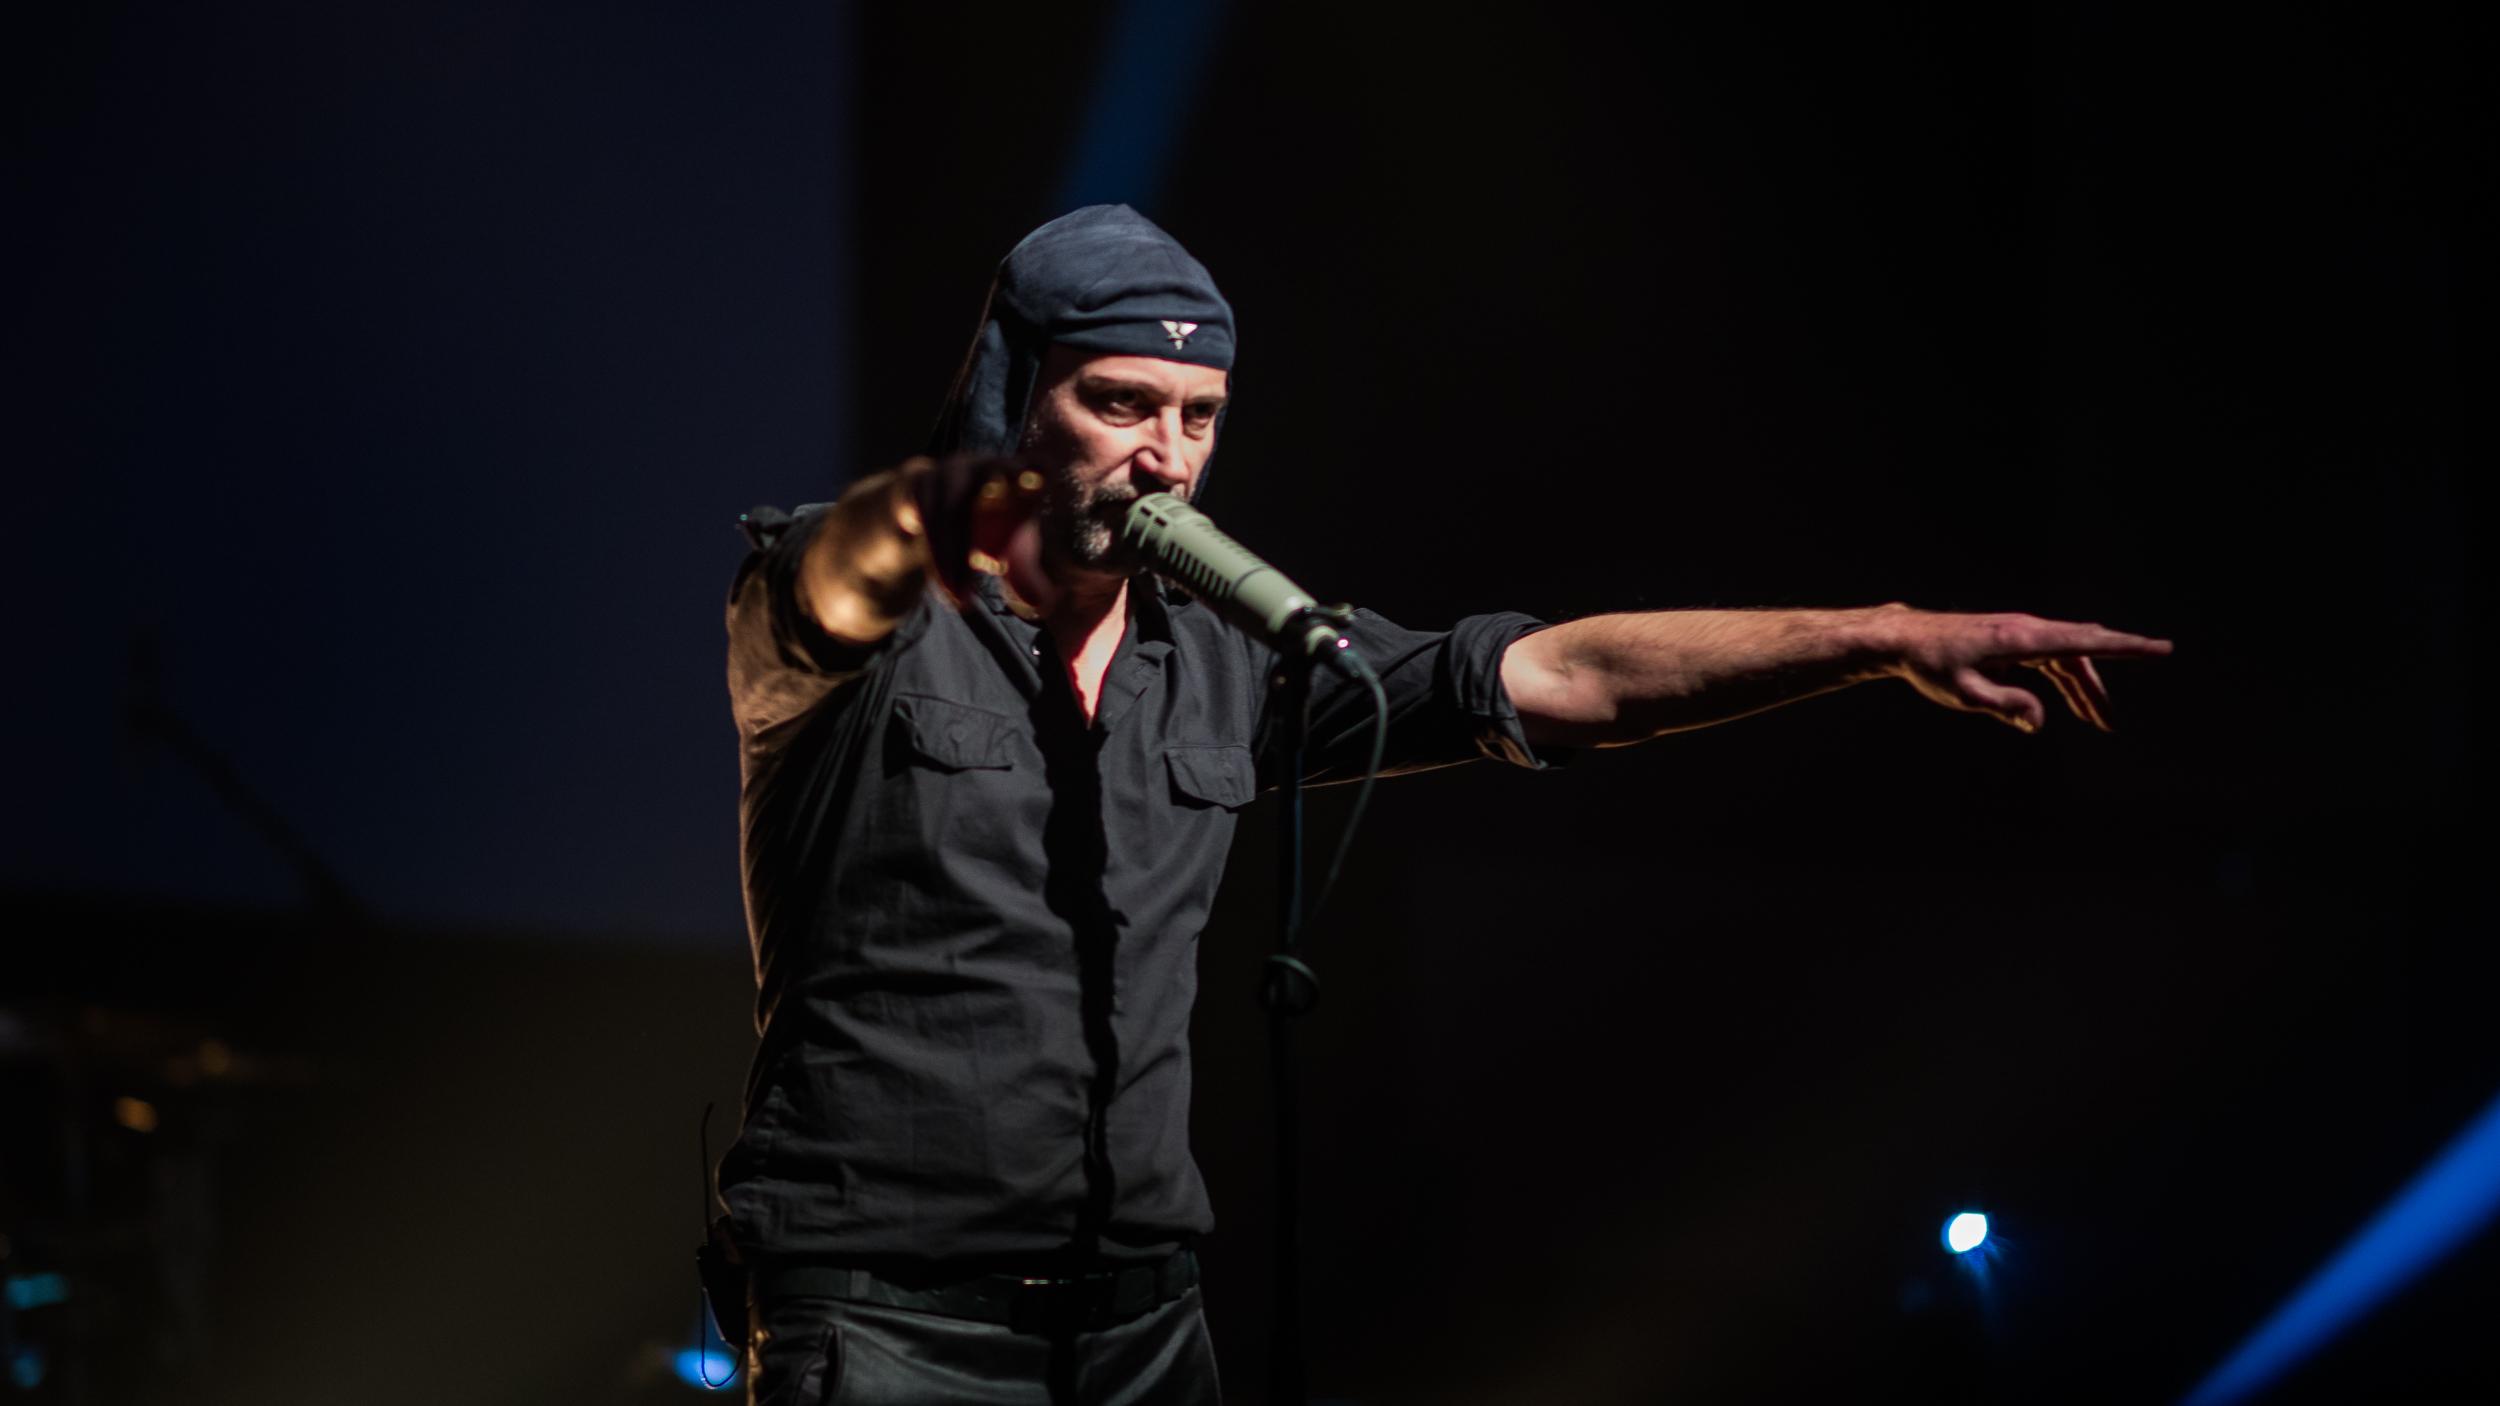 Laibach (photo by Johannes Leszinski)